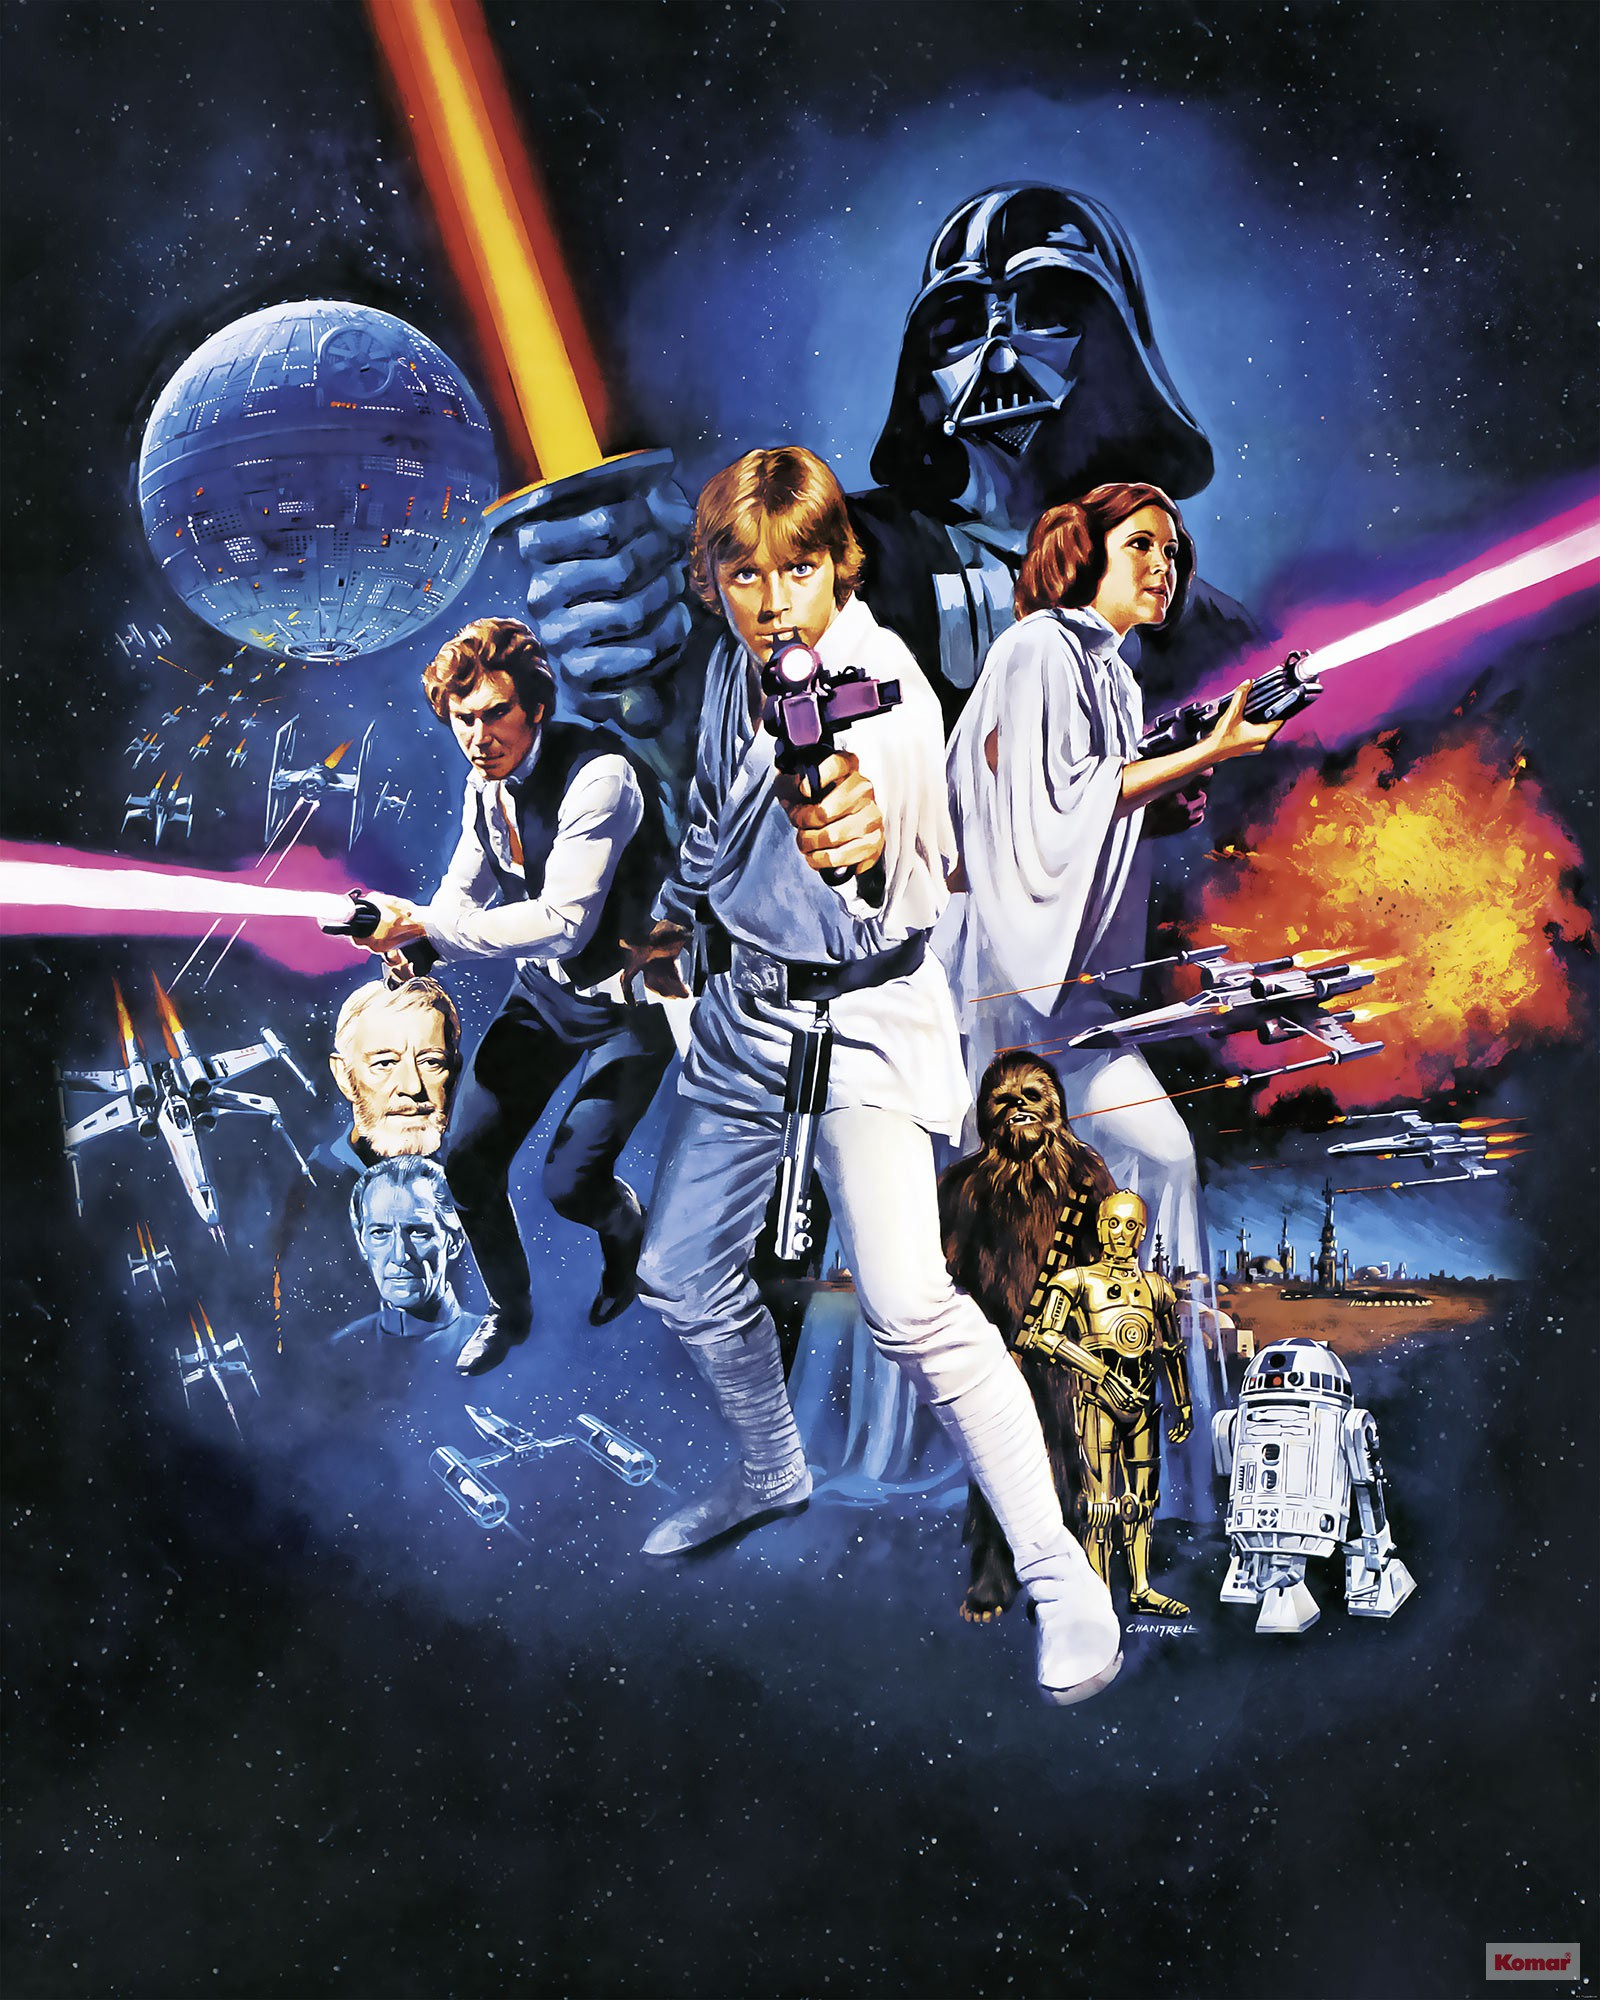 026-dvd2_star_wars_poster_classic_1_web.jpg